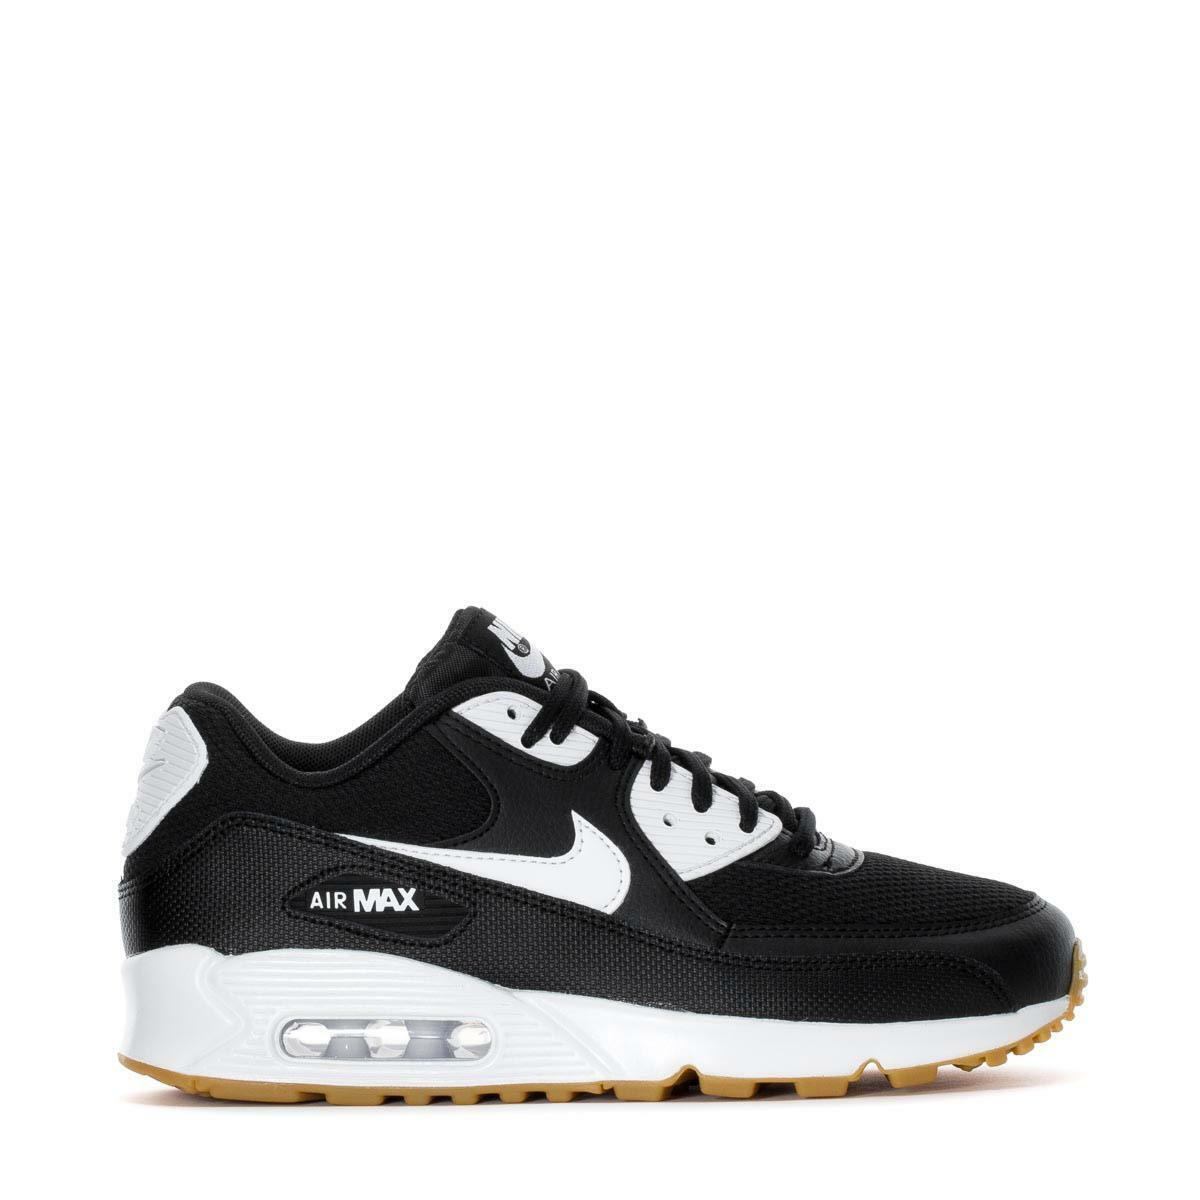 Nike Air Max 90 zapatos negros 325, 213, 055.